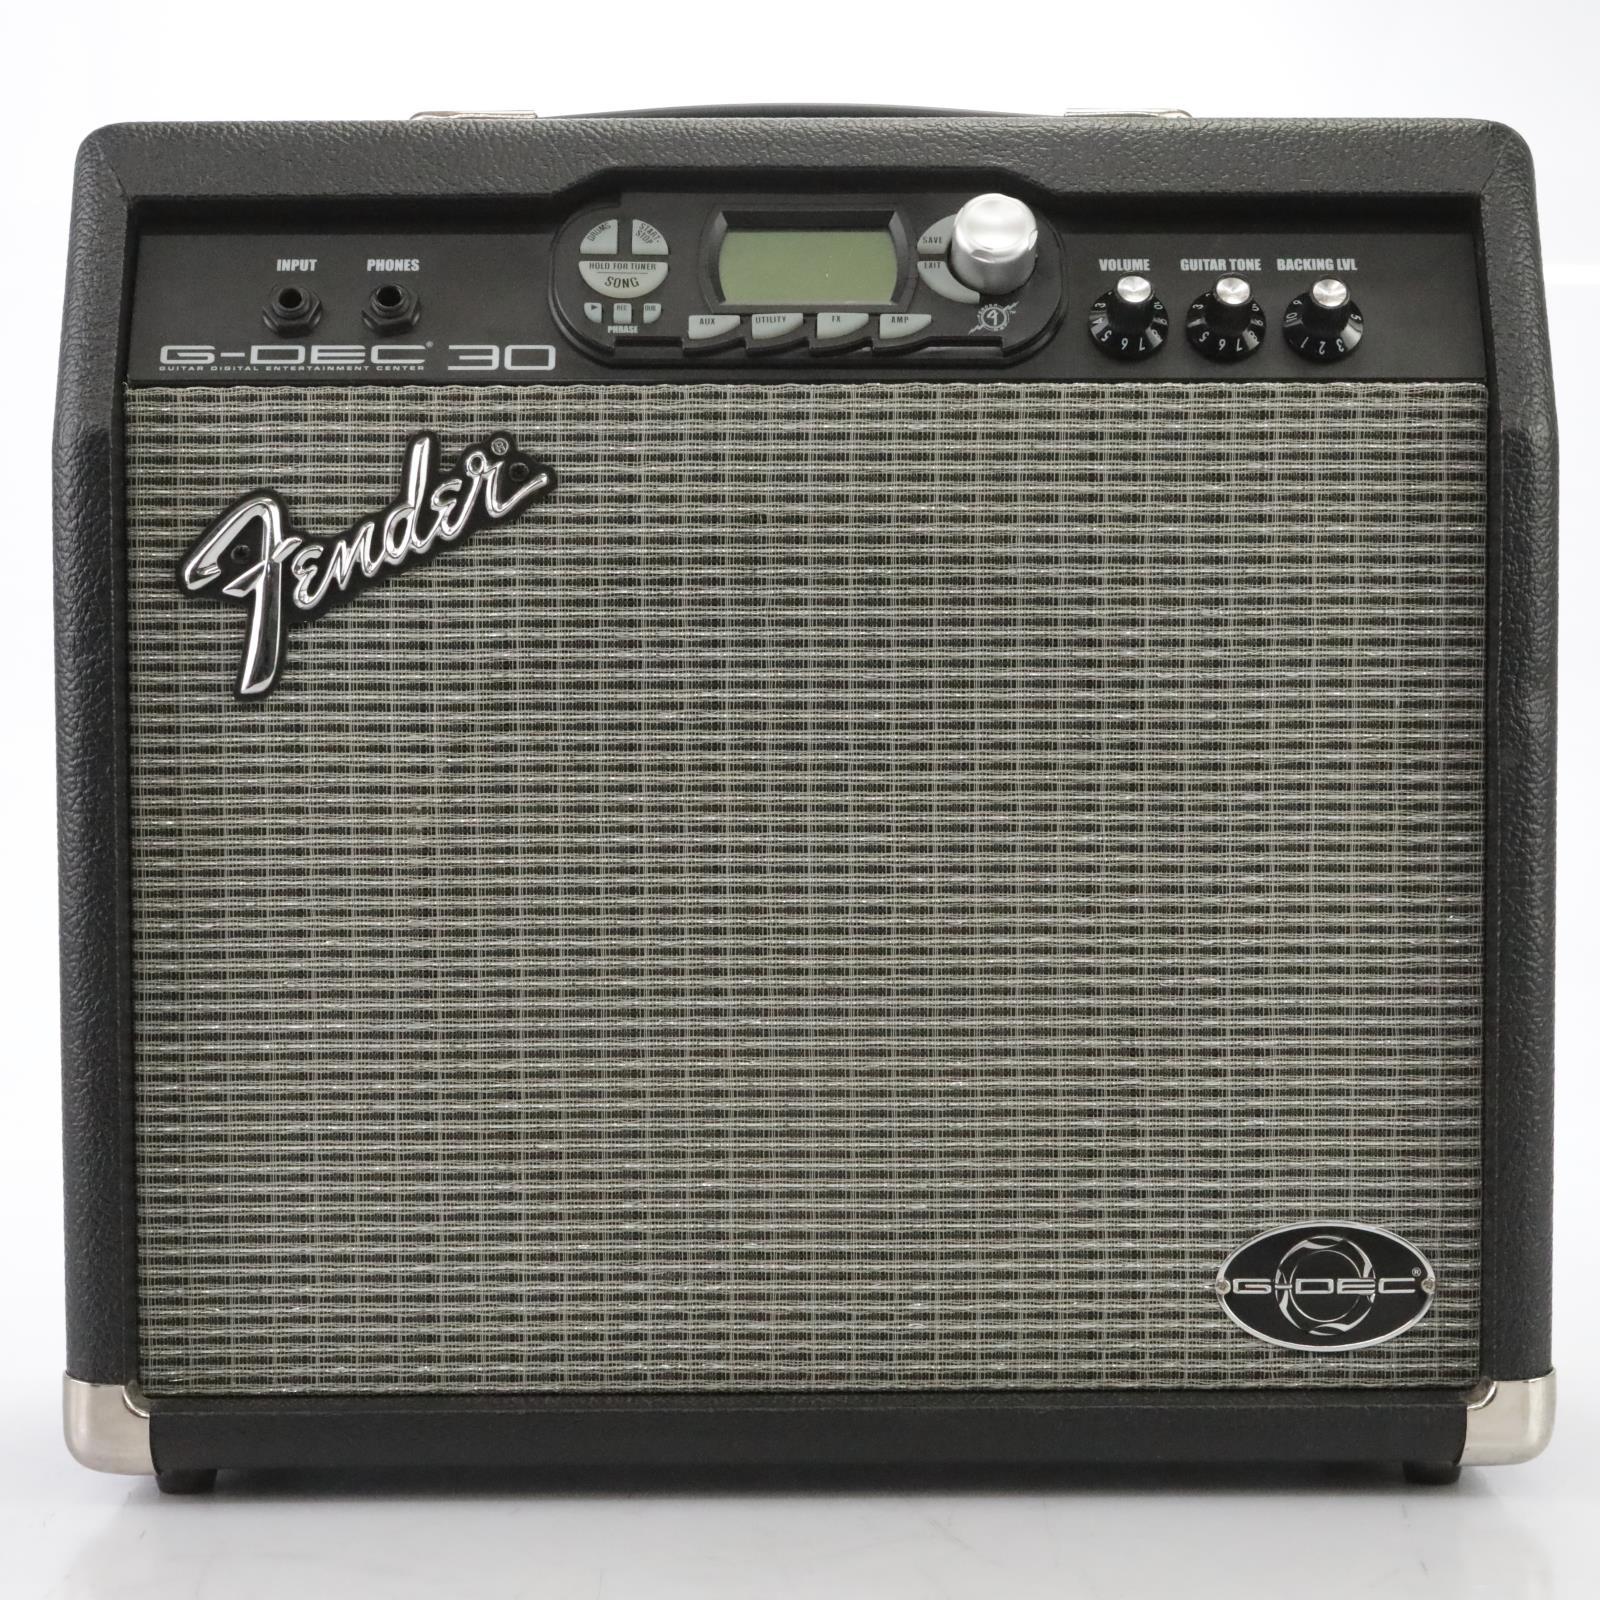 "Fender G-Dec 30 1x10"" Digital Guitar Combo Amp w/ Fender ULT-4 Footswitch #44847"